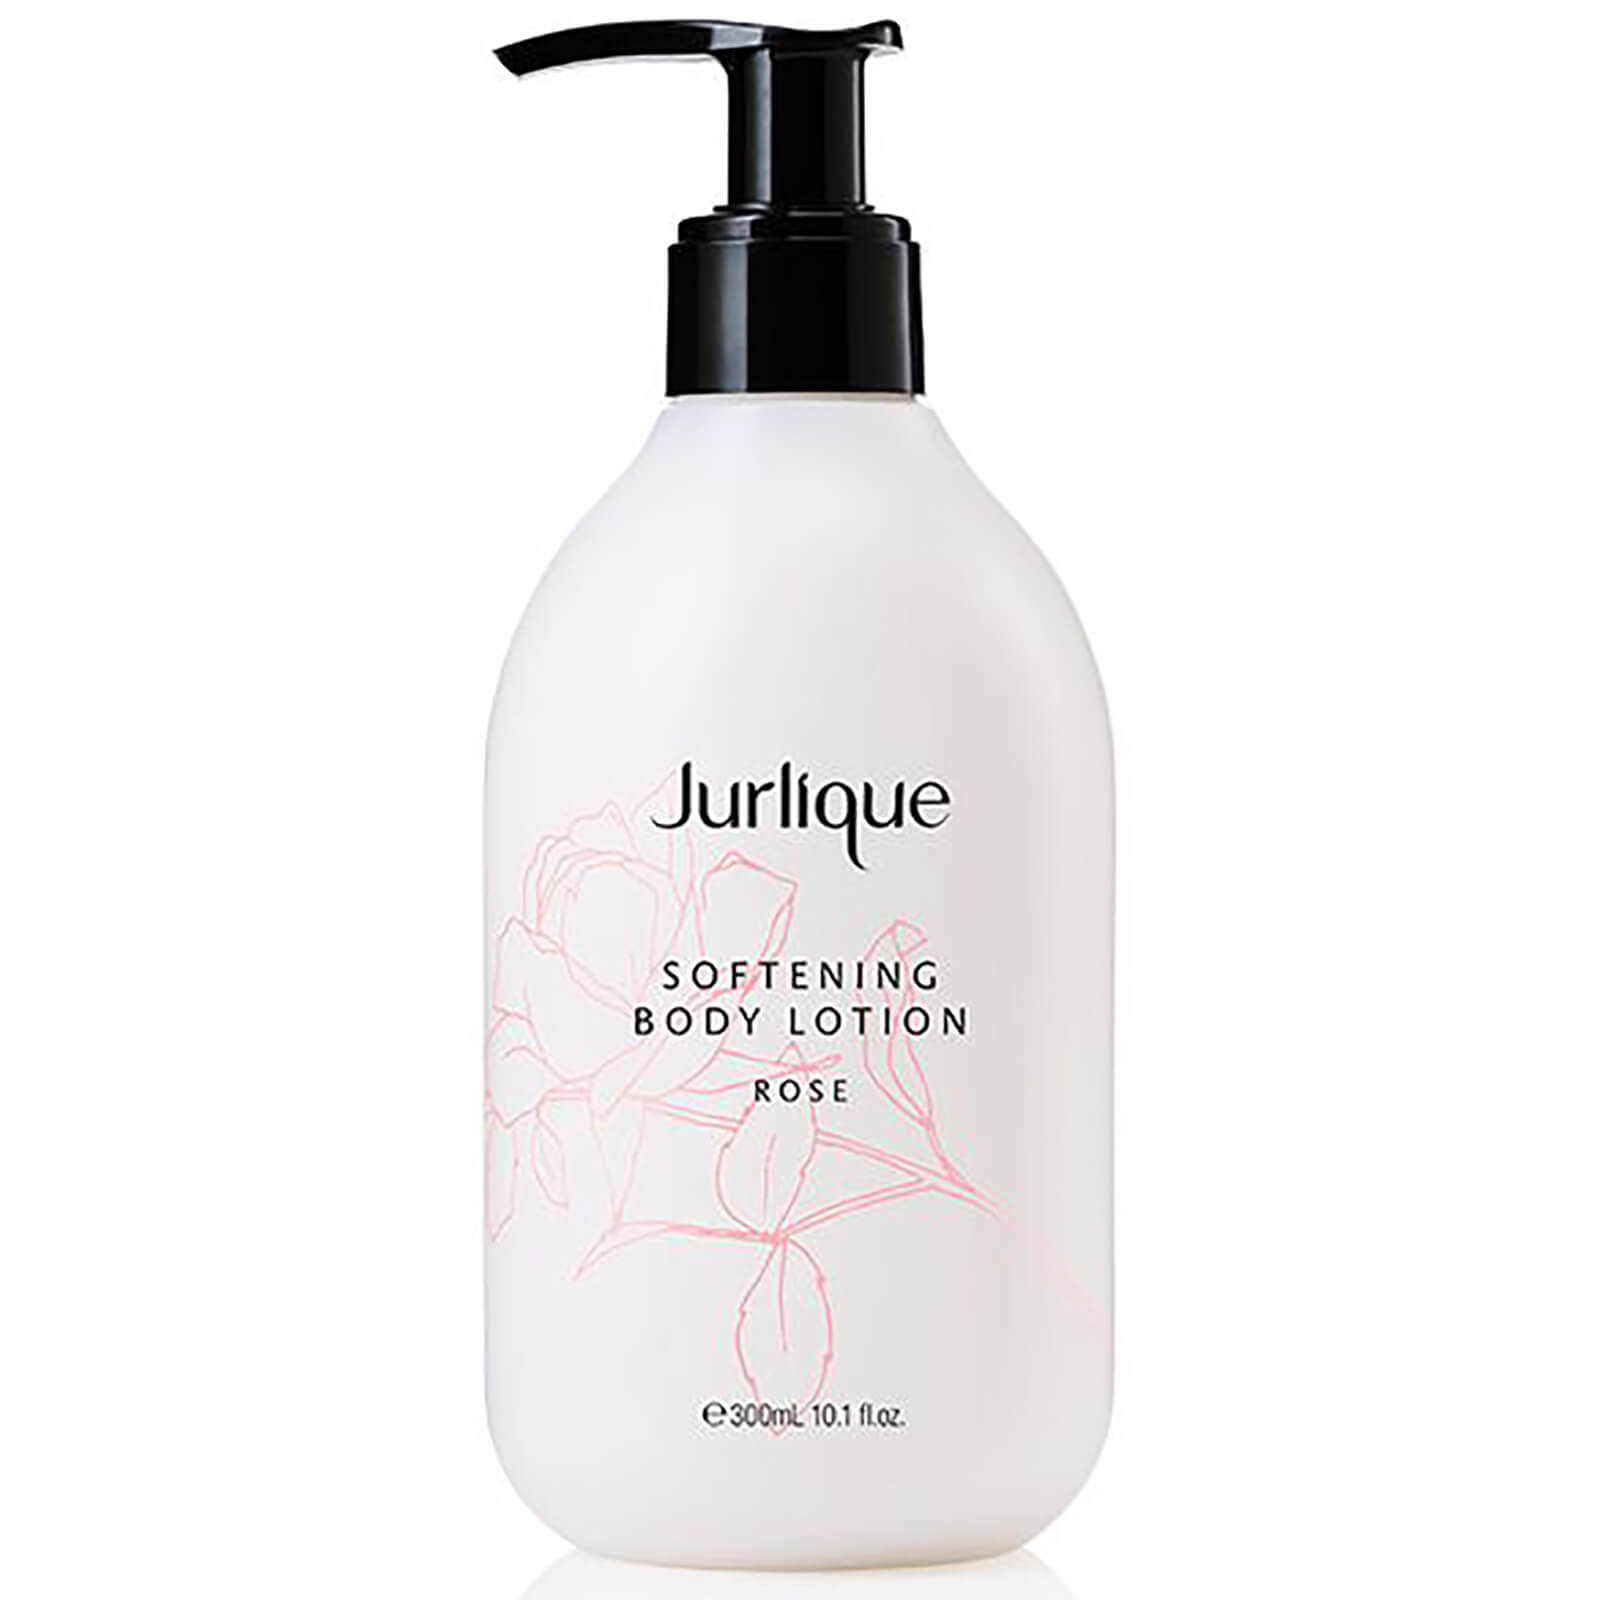 Jurlique Softening Body Lotion Rose 300ml